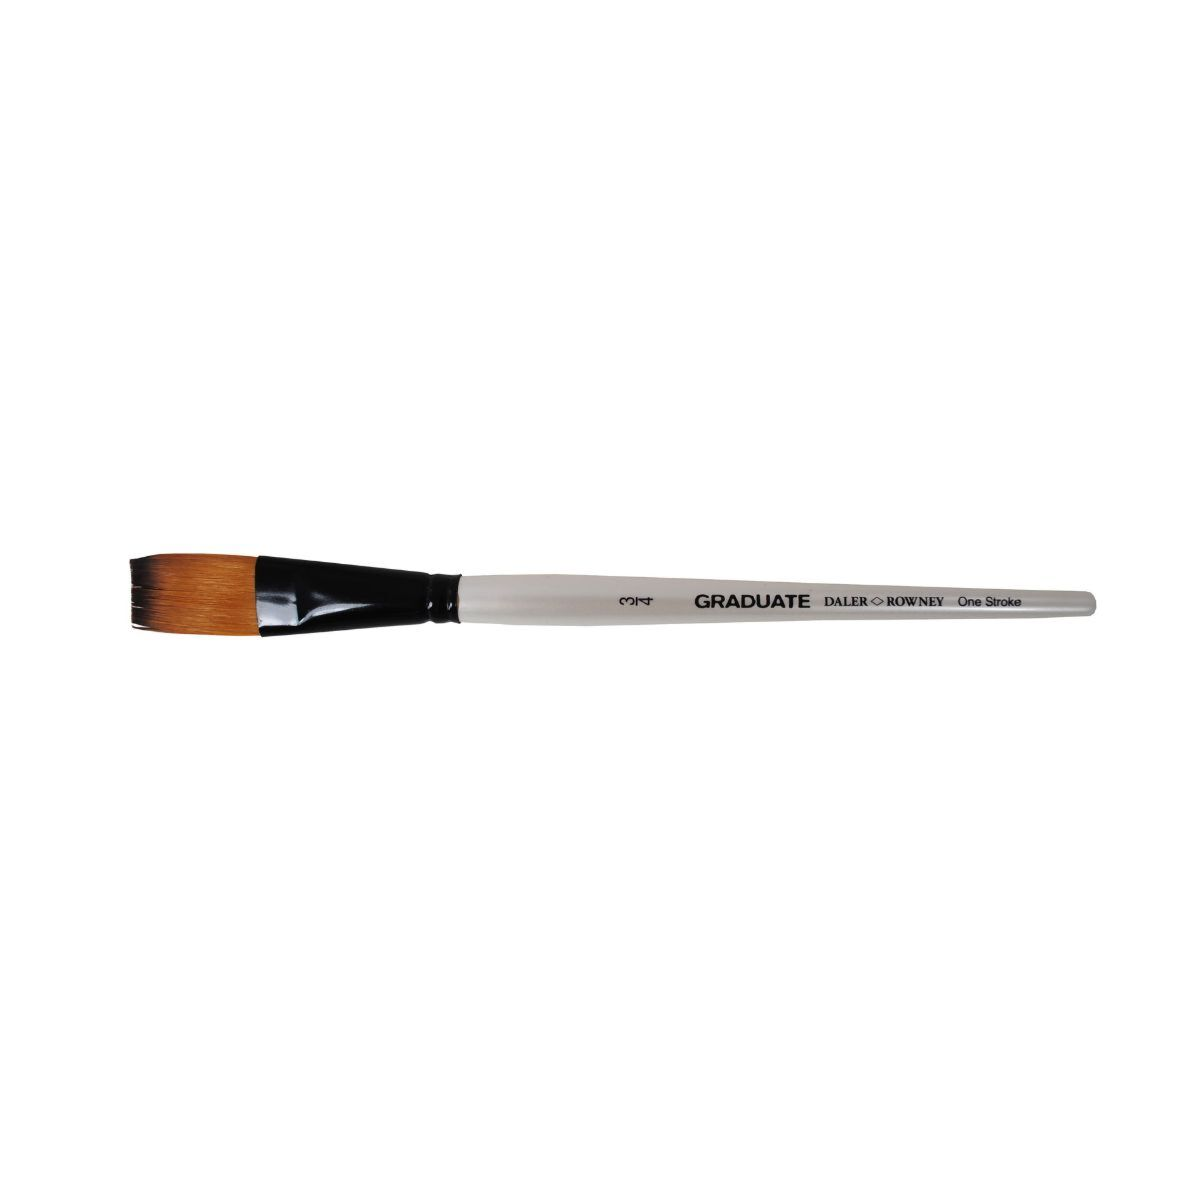 Daler Rowney Graduate Brush One Stroke Three Quarter